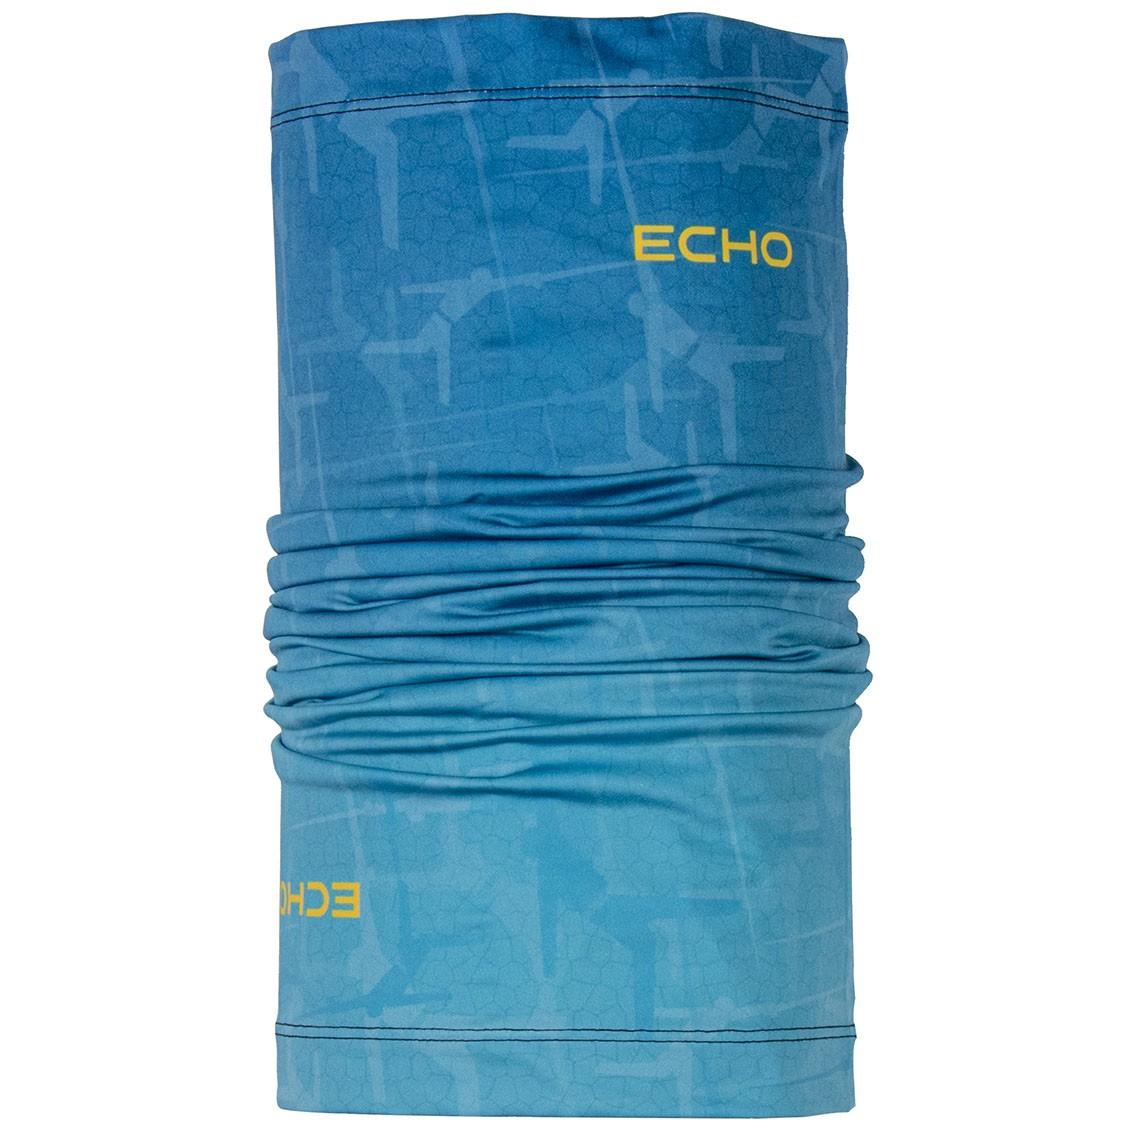 Bandana ECHO Neckgaiter Blue